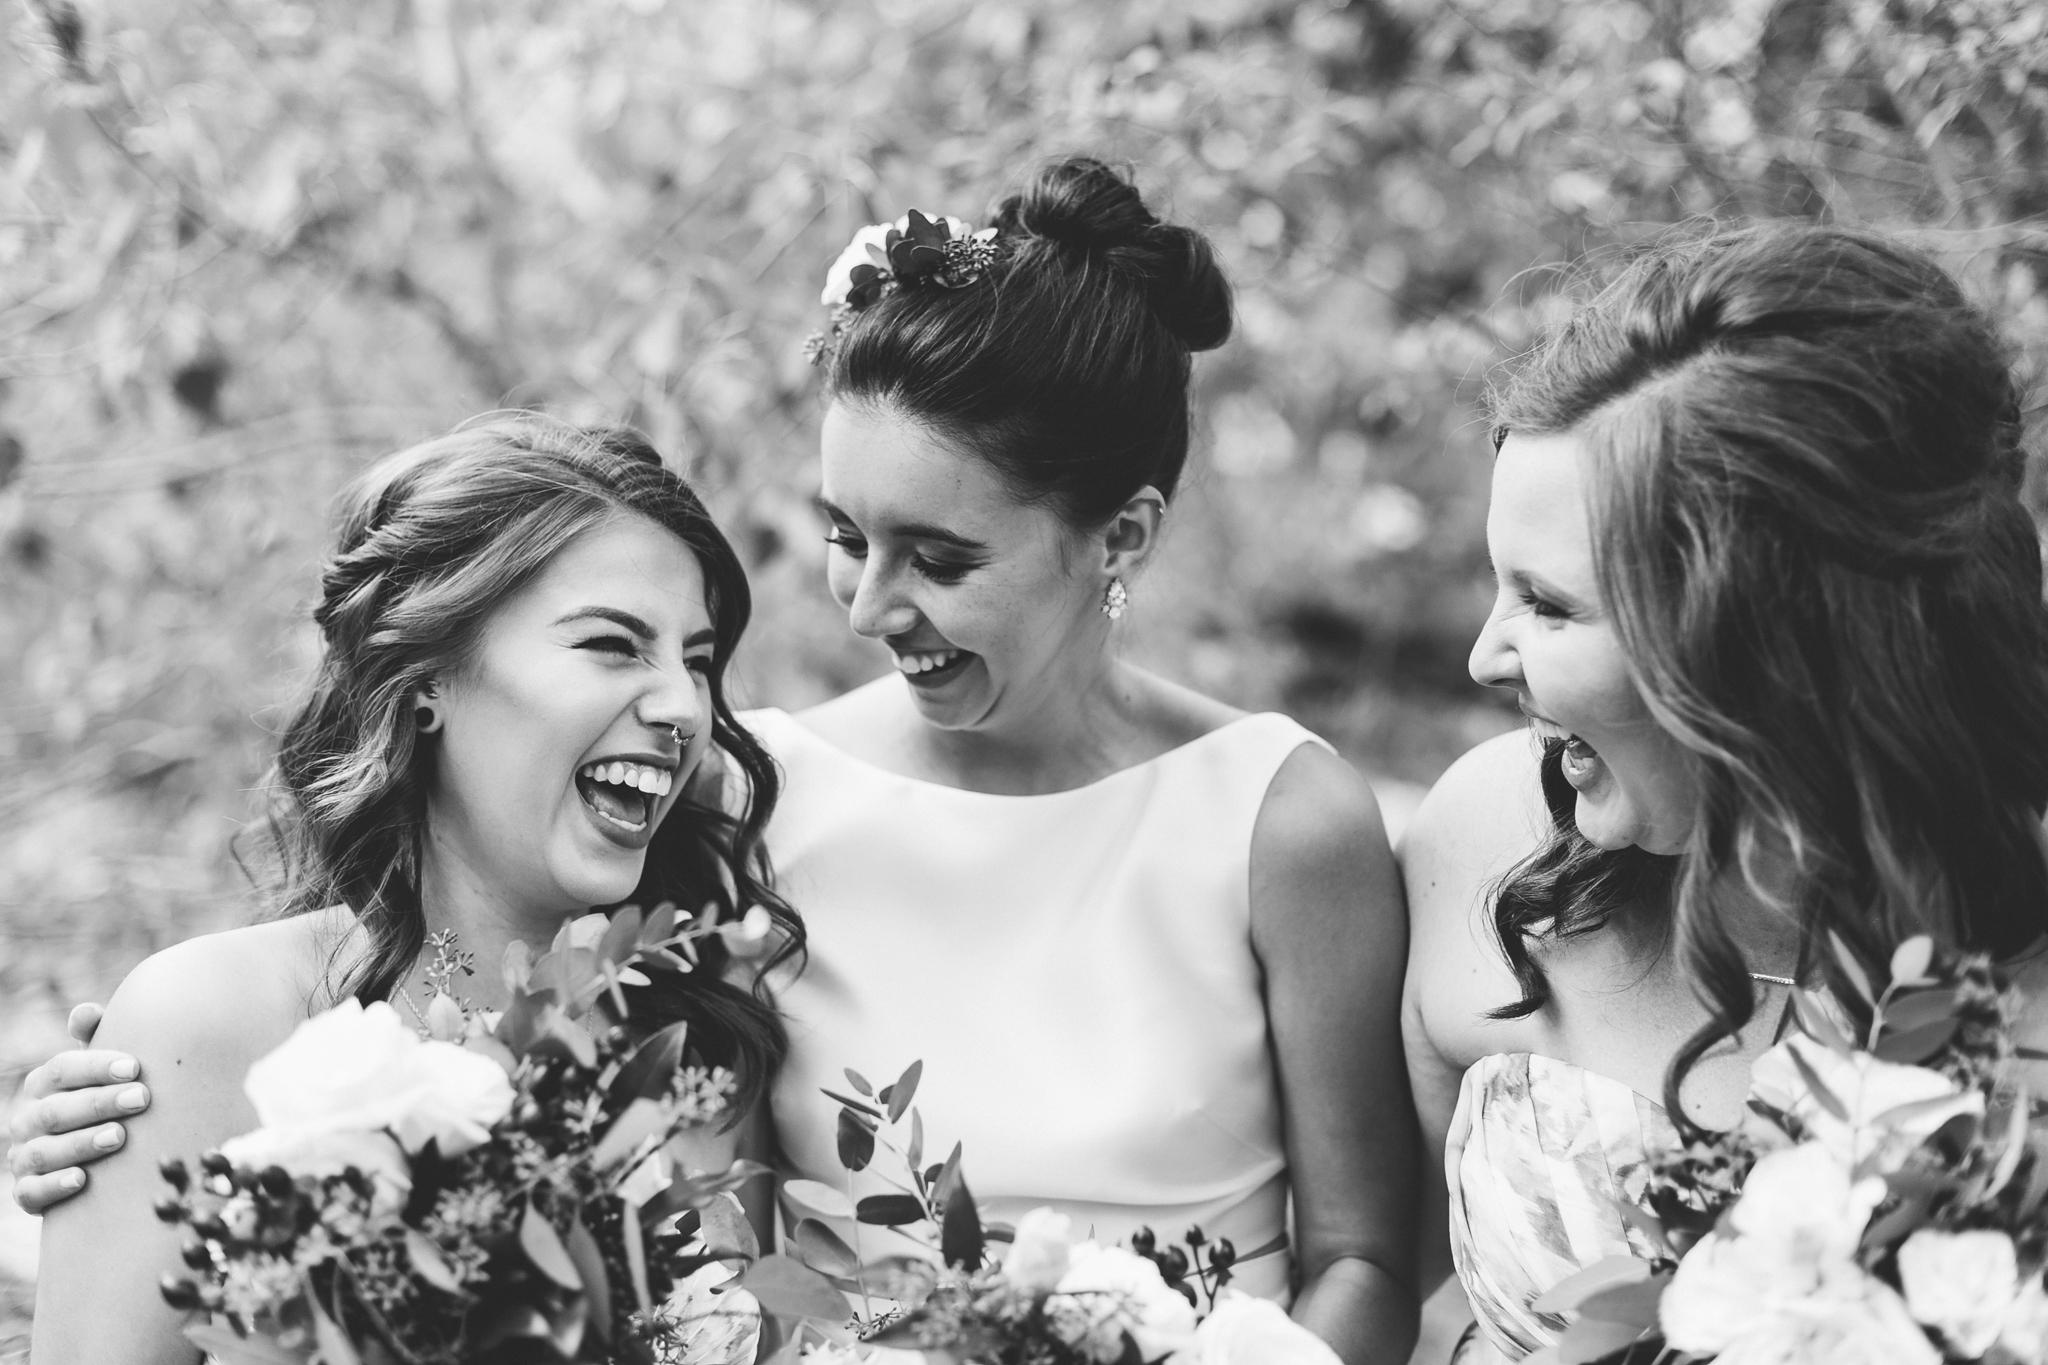 lethbridge-wedding-photographer-love-and-be-loved-photography-kurtis-beth-springbreak-flower-farm-crowsnest-pass-mountain-picture-image-photo-5.jpg